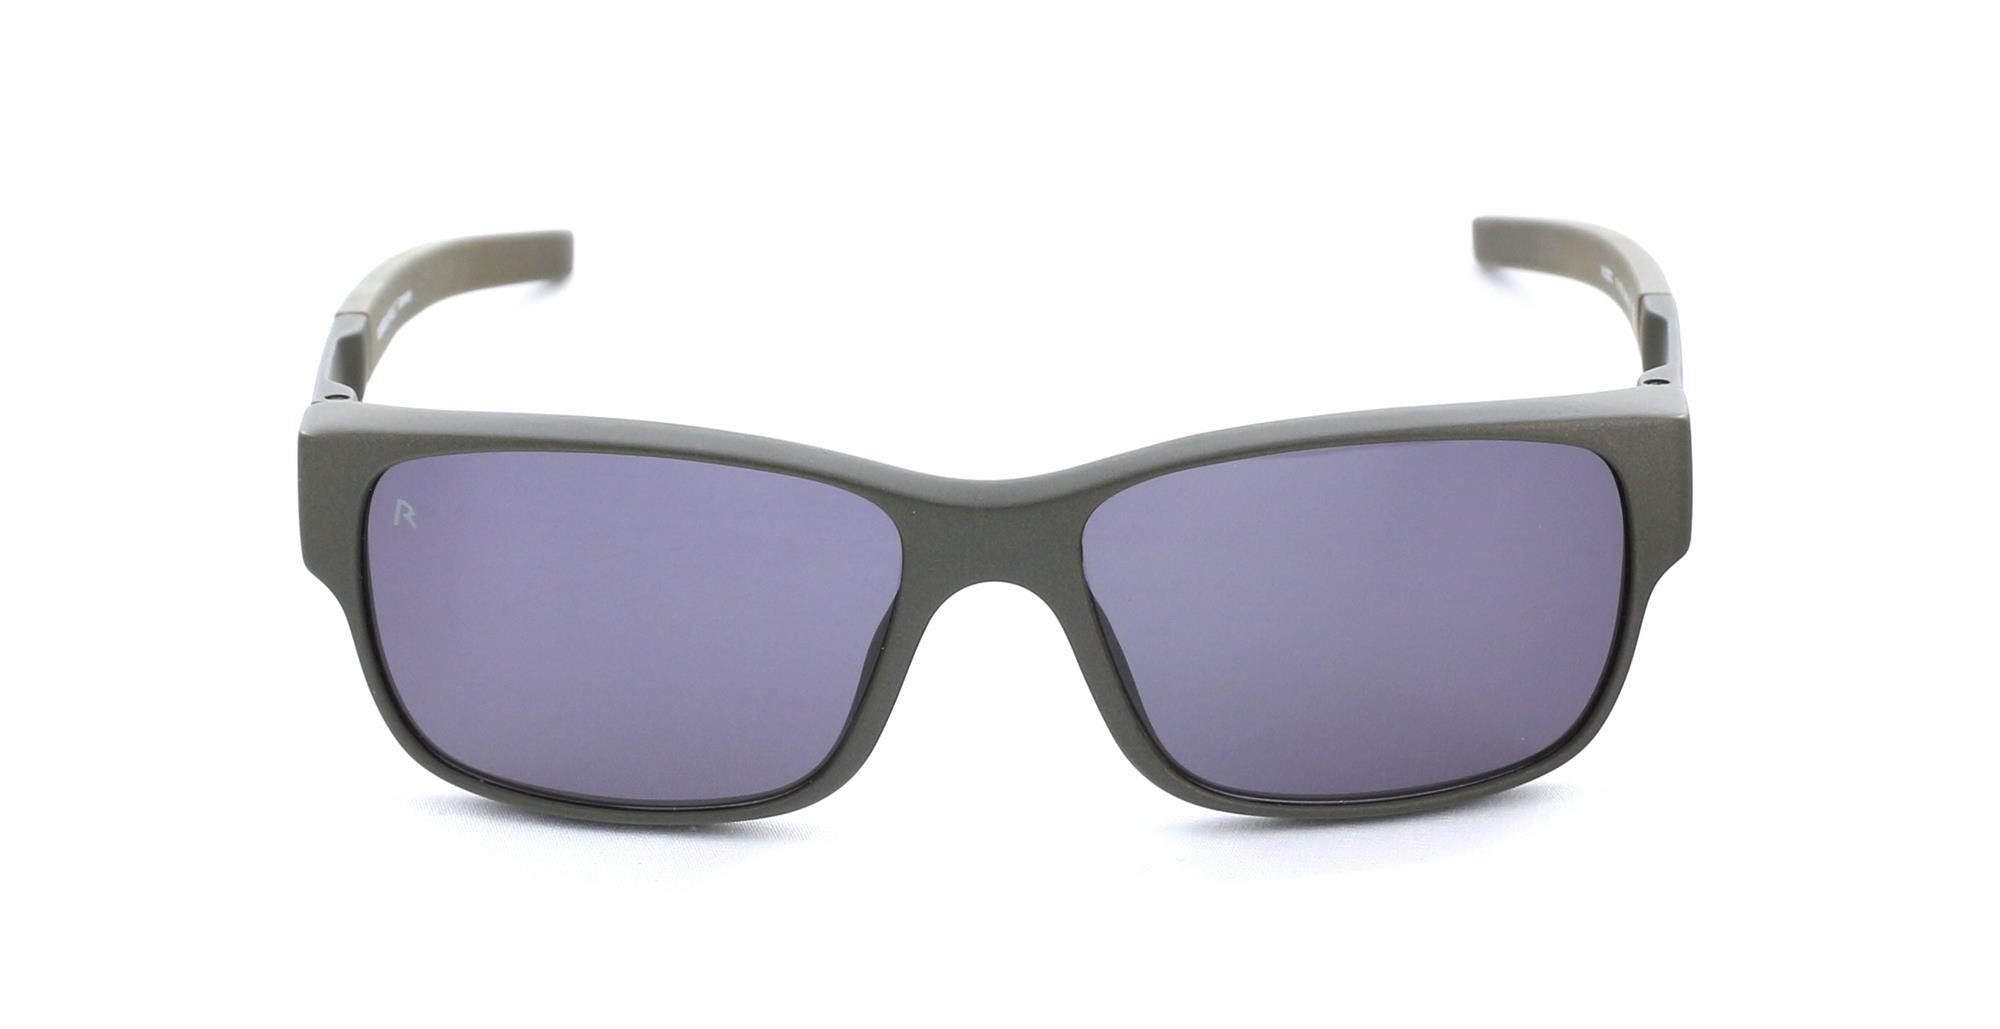 Rodenstock Sonnenbrille (R3272 A 54) glkHtvf